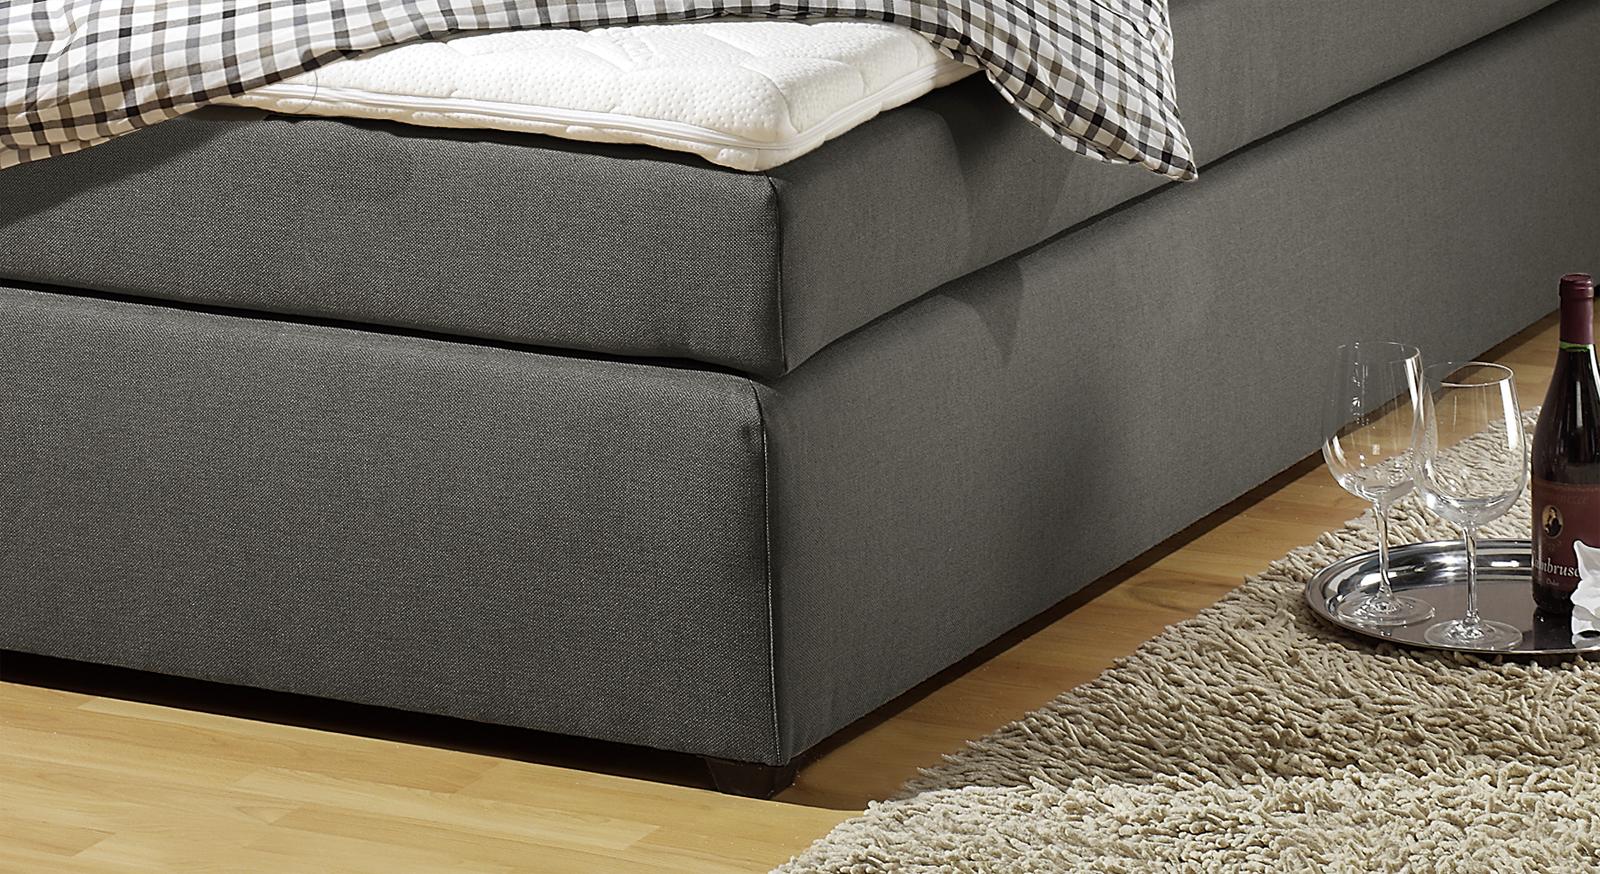 boxspringbett in h3 bis 130kg k rpergewicht chicago. Black Bedroom Furniture Sets. Home Design Ideas